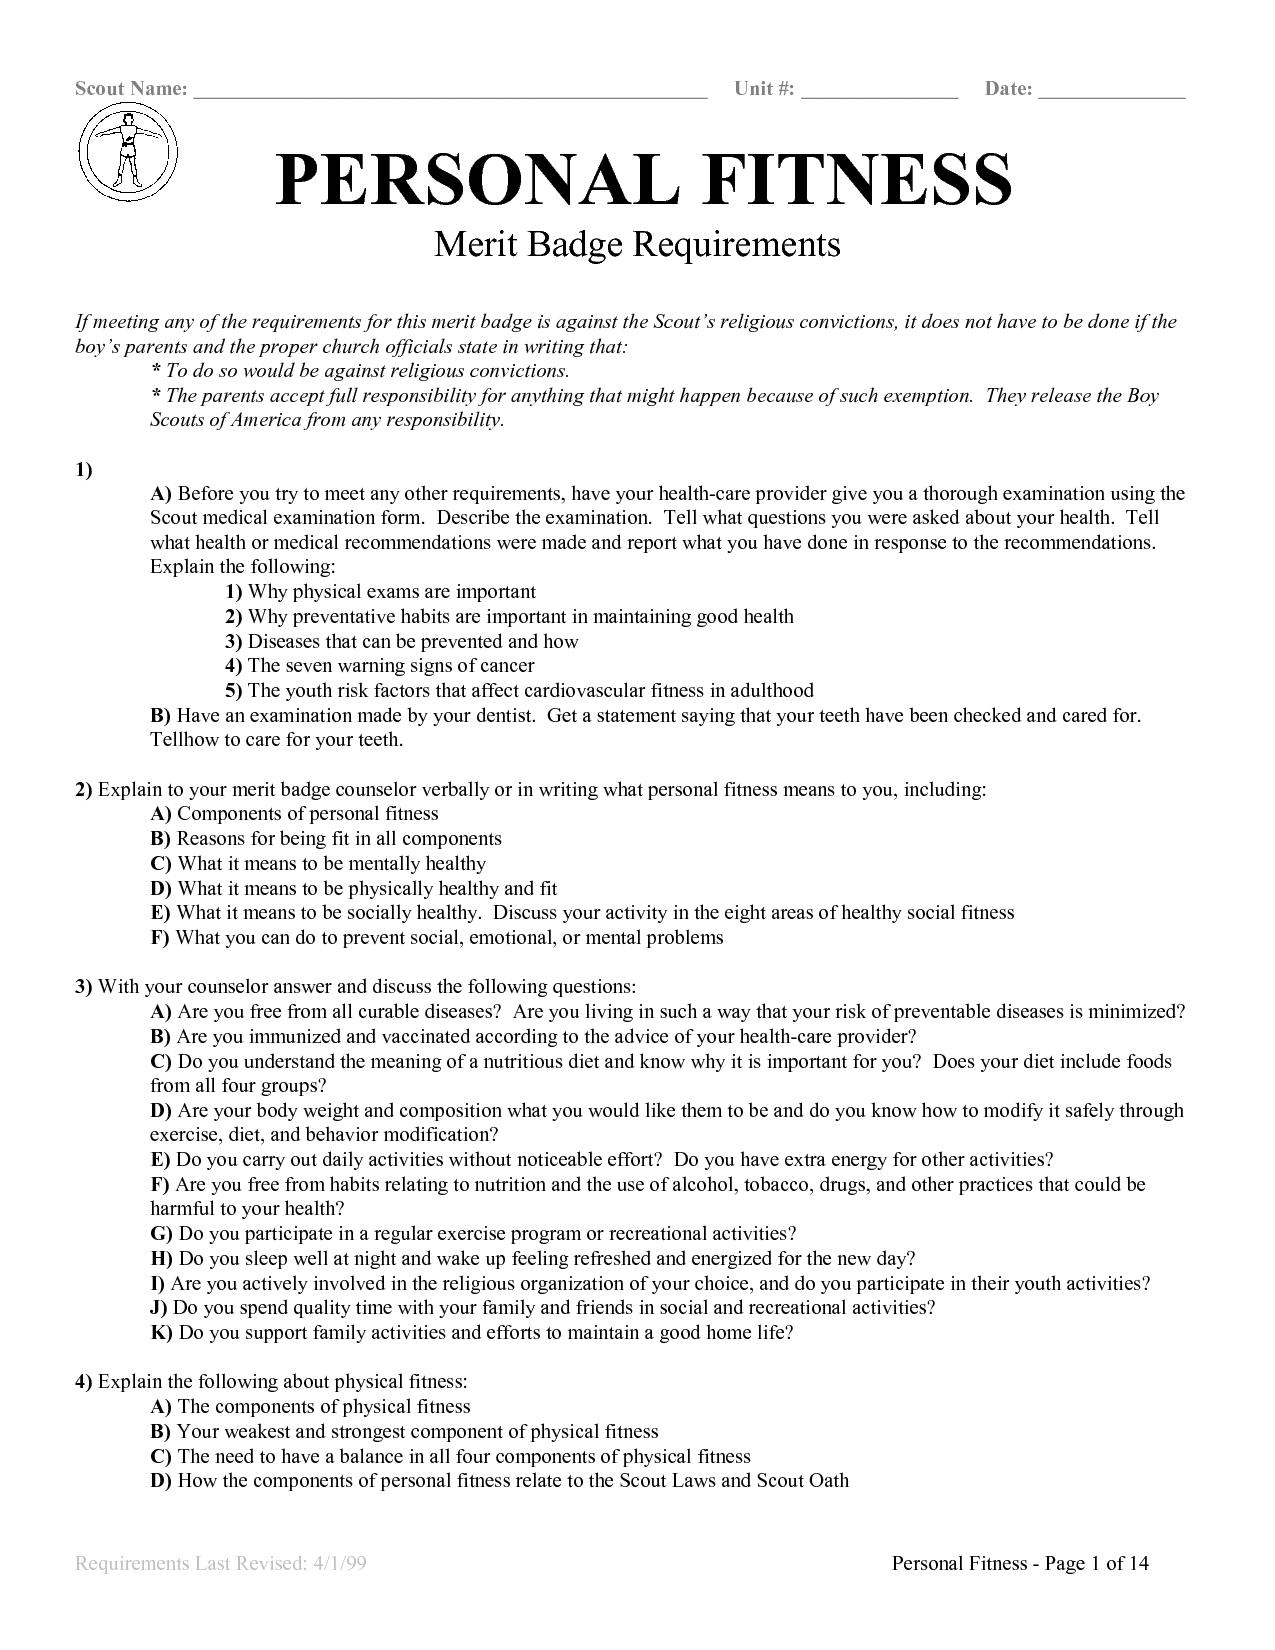 10 Best Images of Family Life Merit Badge Worksheet  Personal Management Merit Badge Worksheet